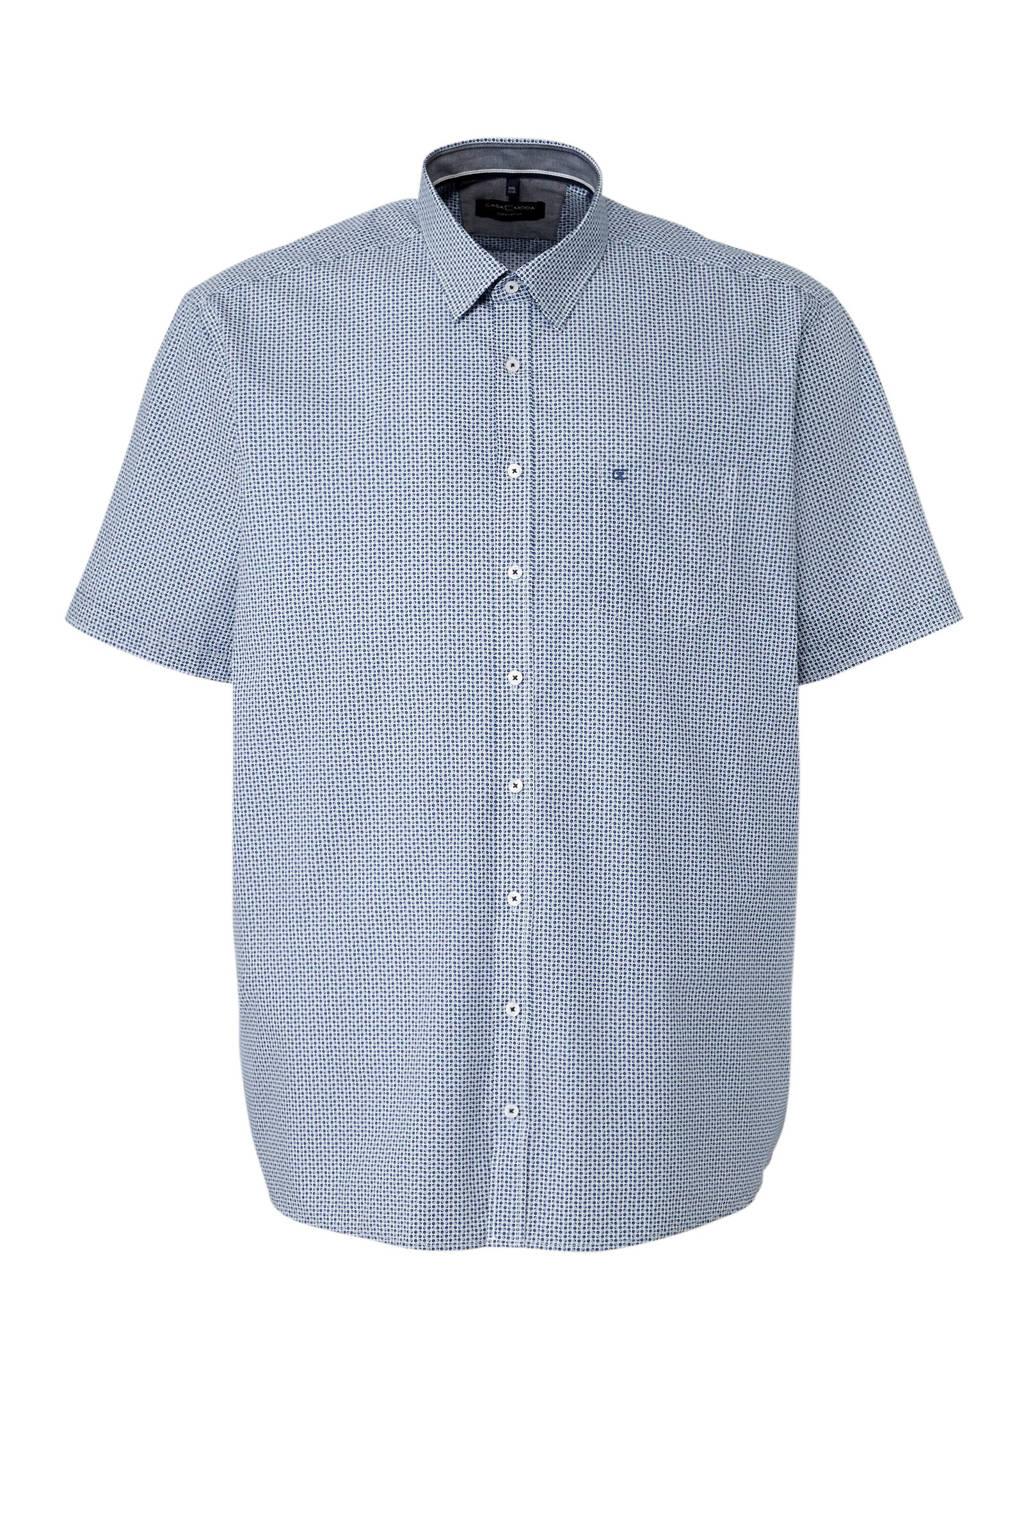 Casa Moda +size overhemd met allover print, blauw/ wit